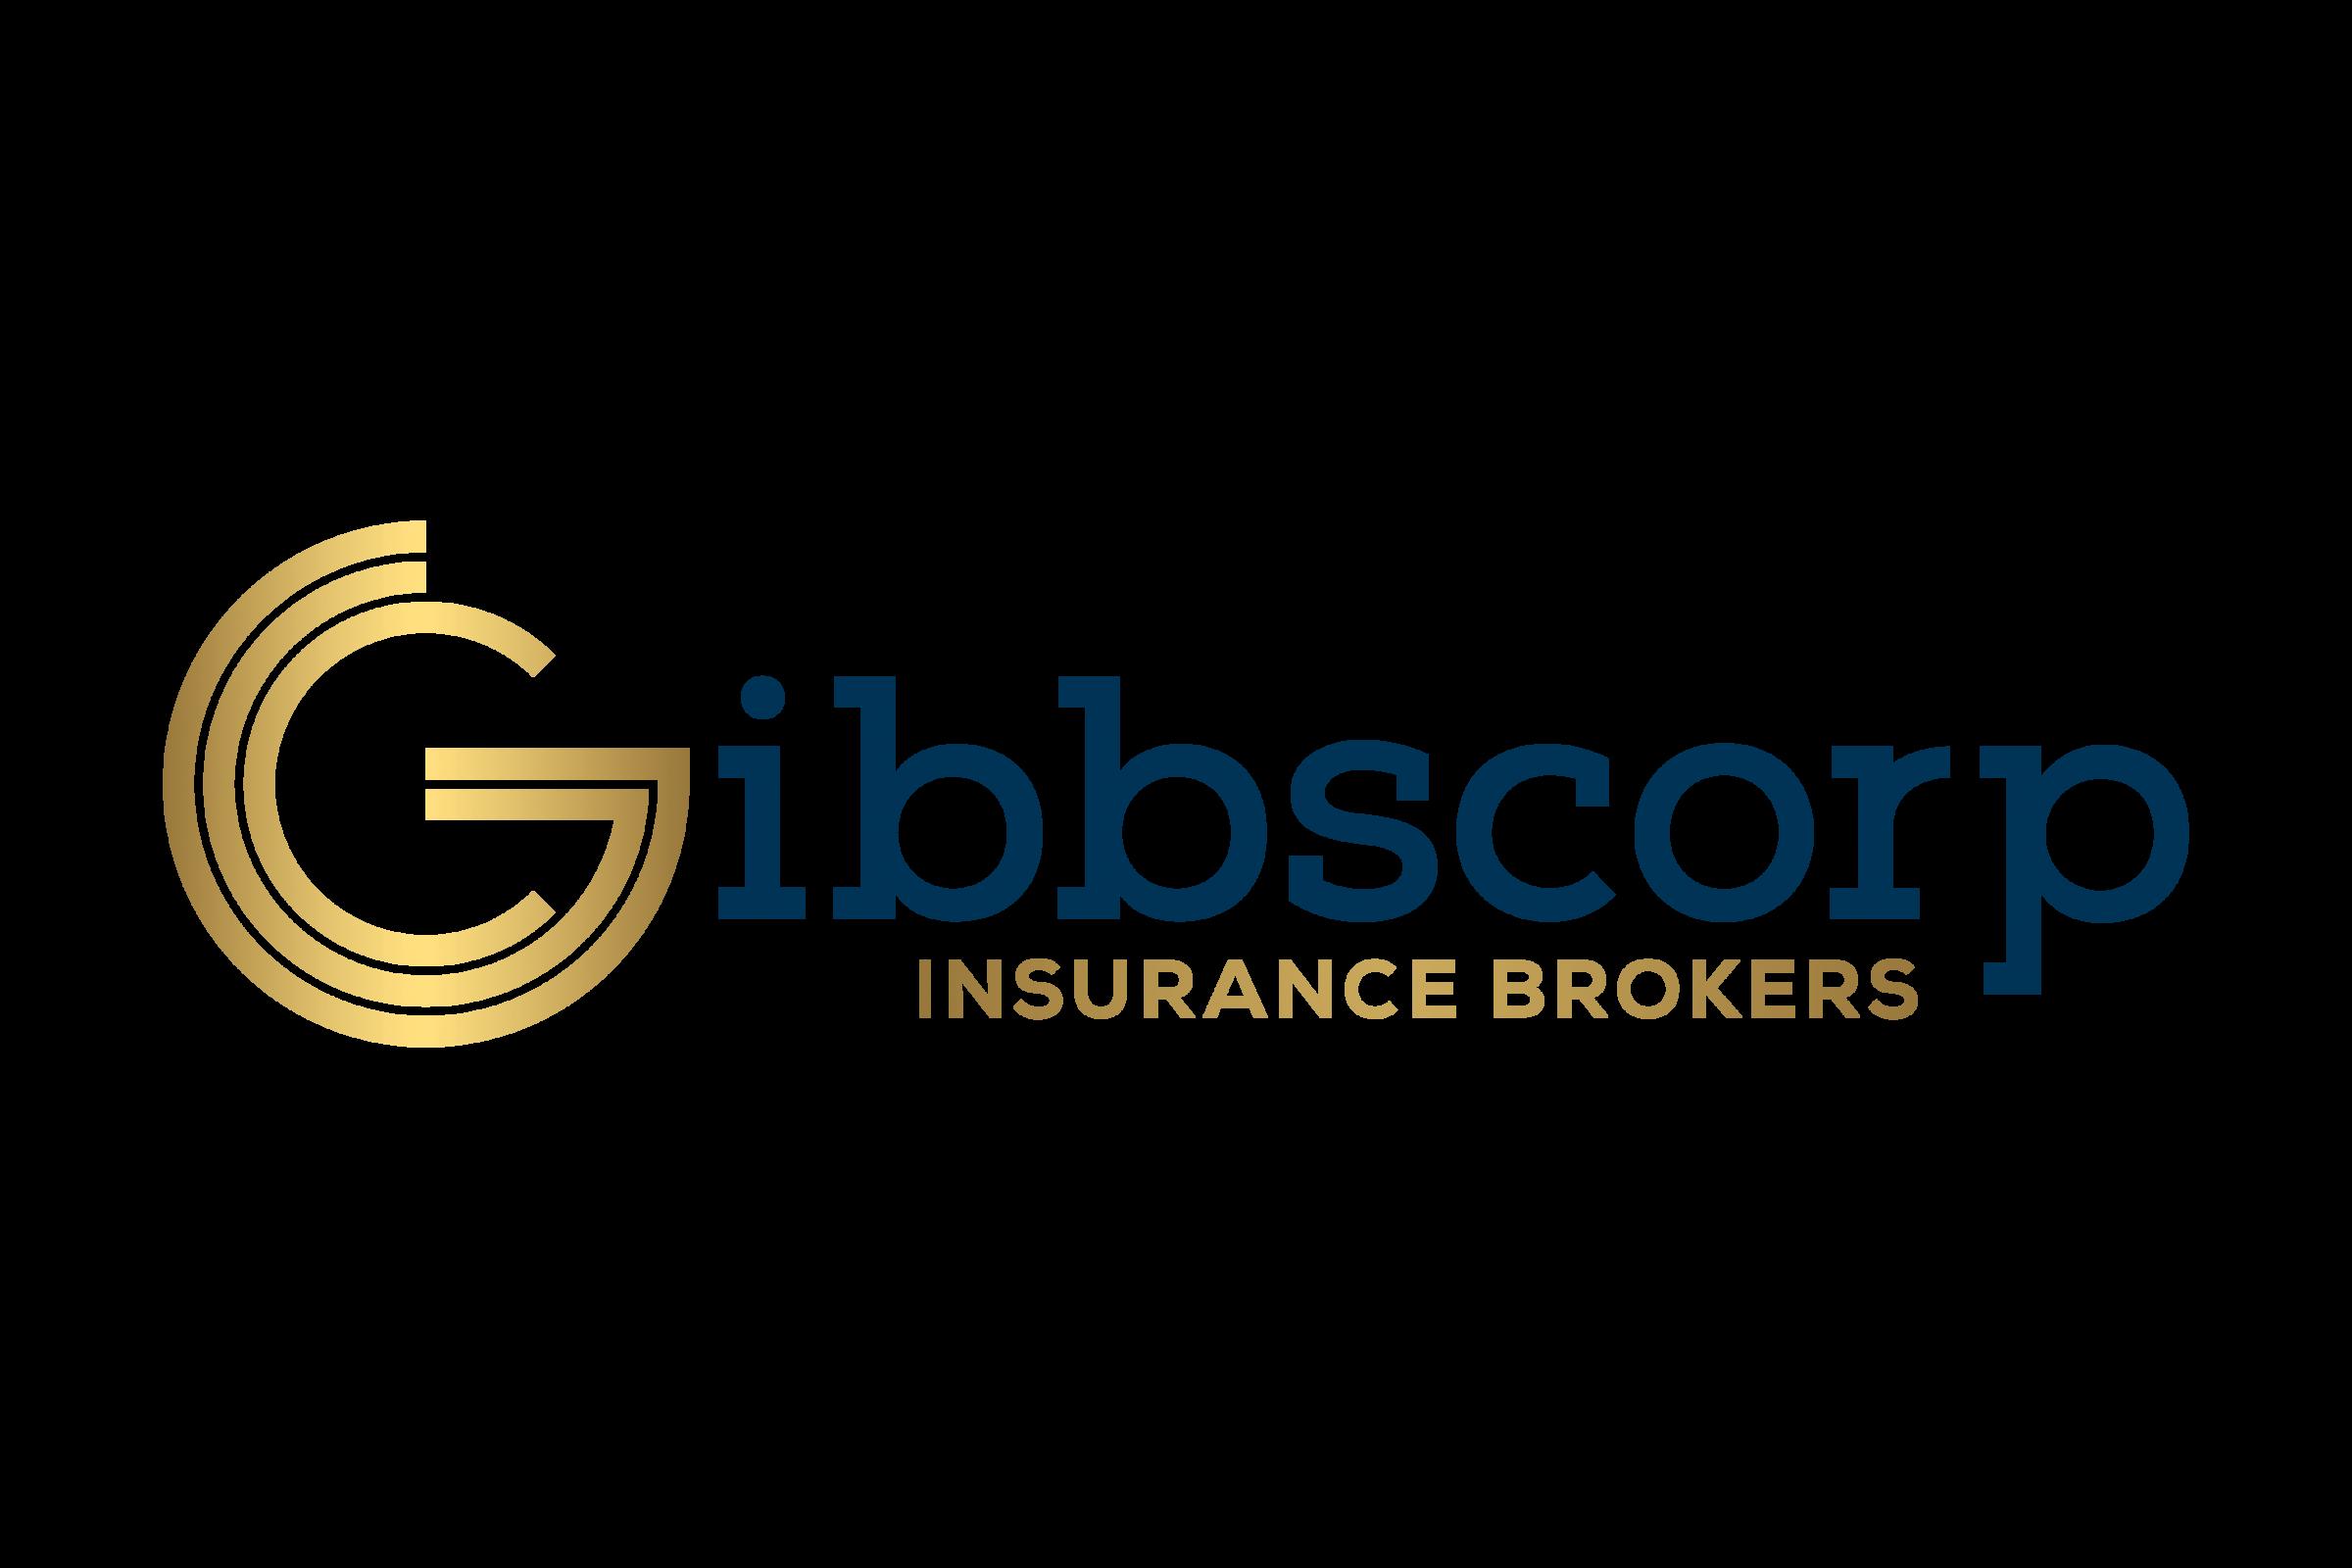 gibbscorp logo